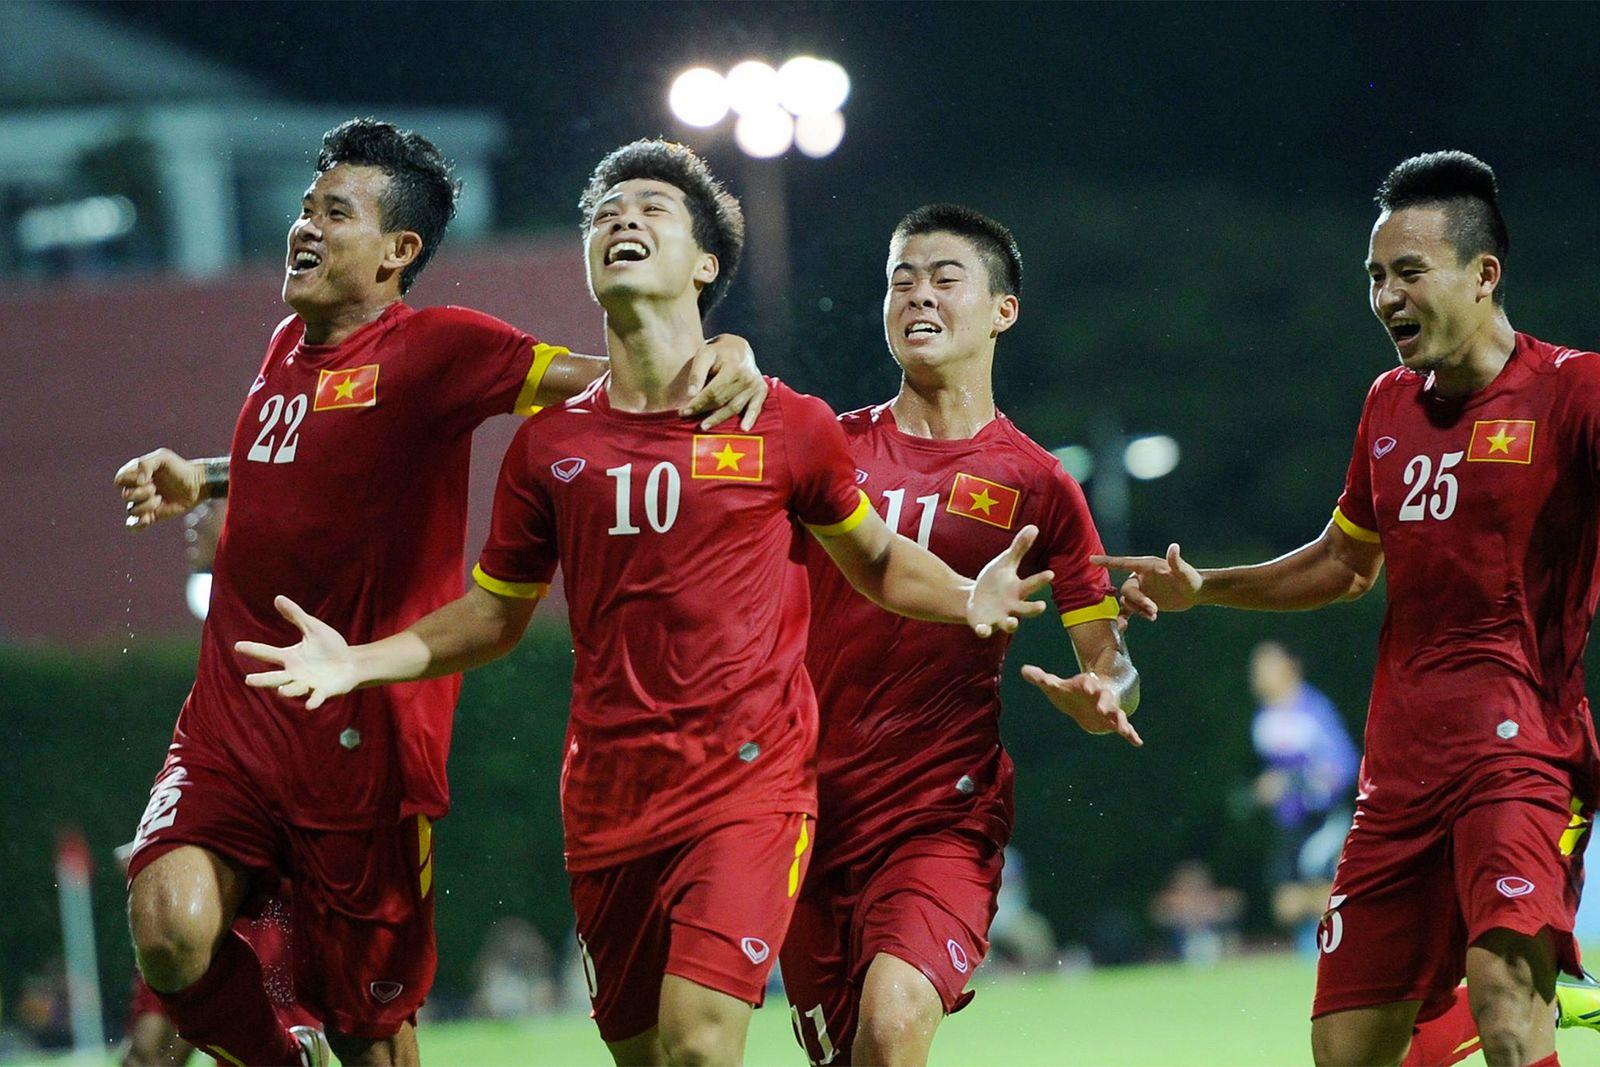 Vietnam Men's Football Team Enters World's Top 100 Again